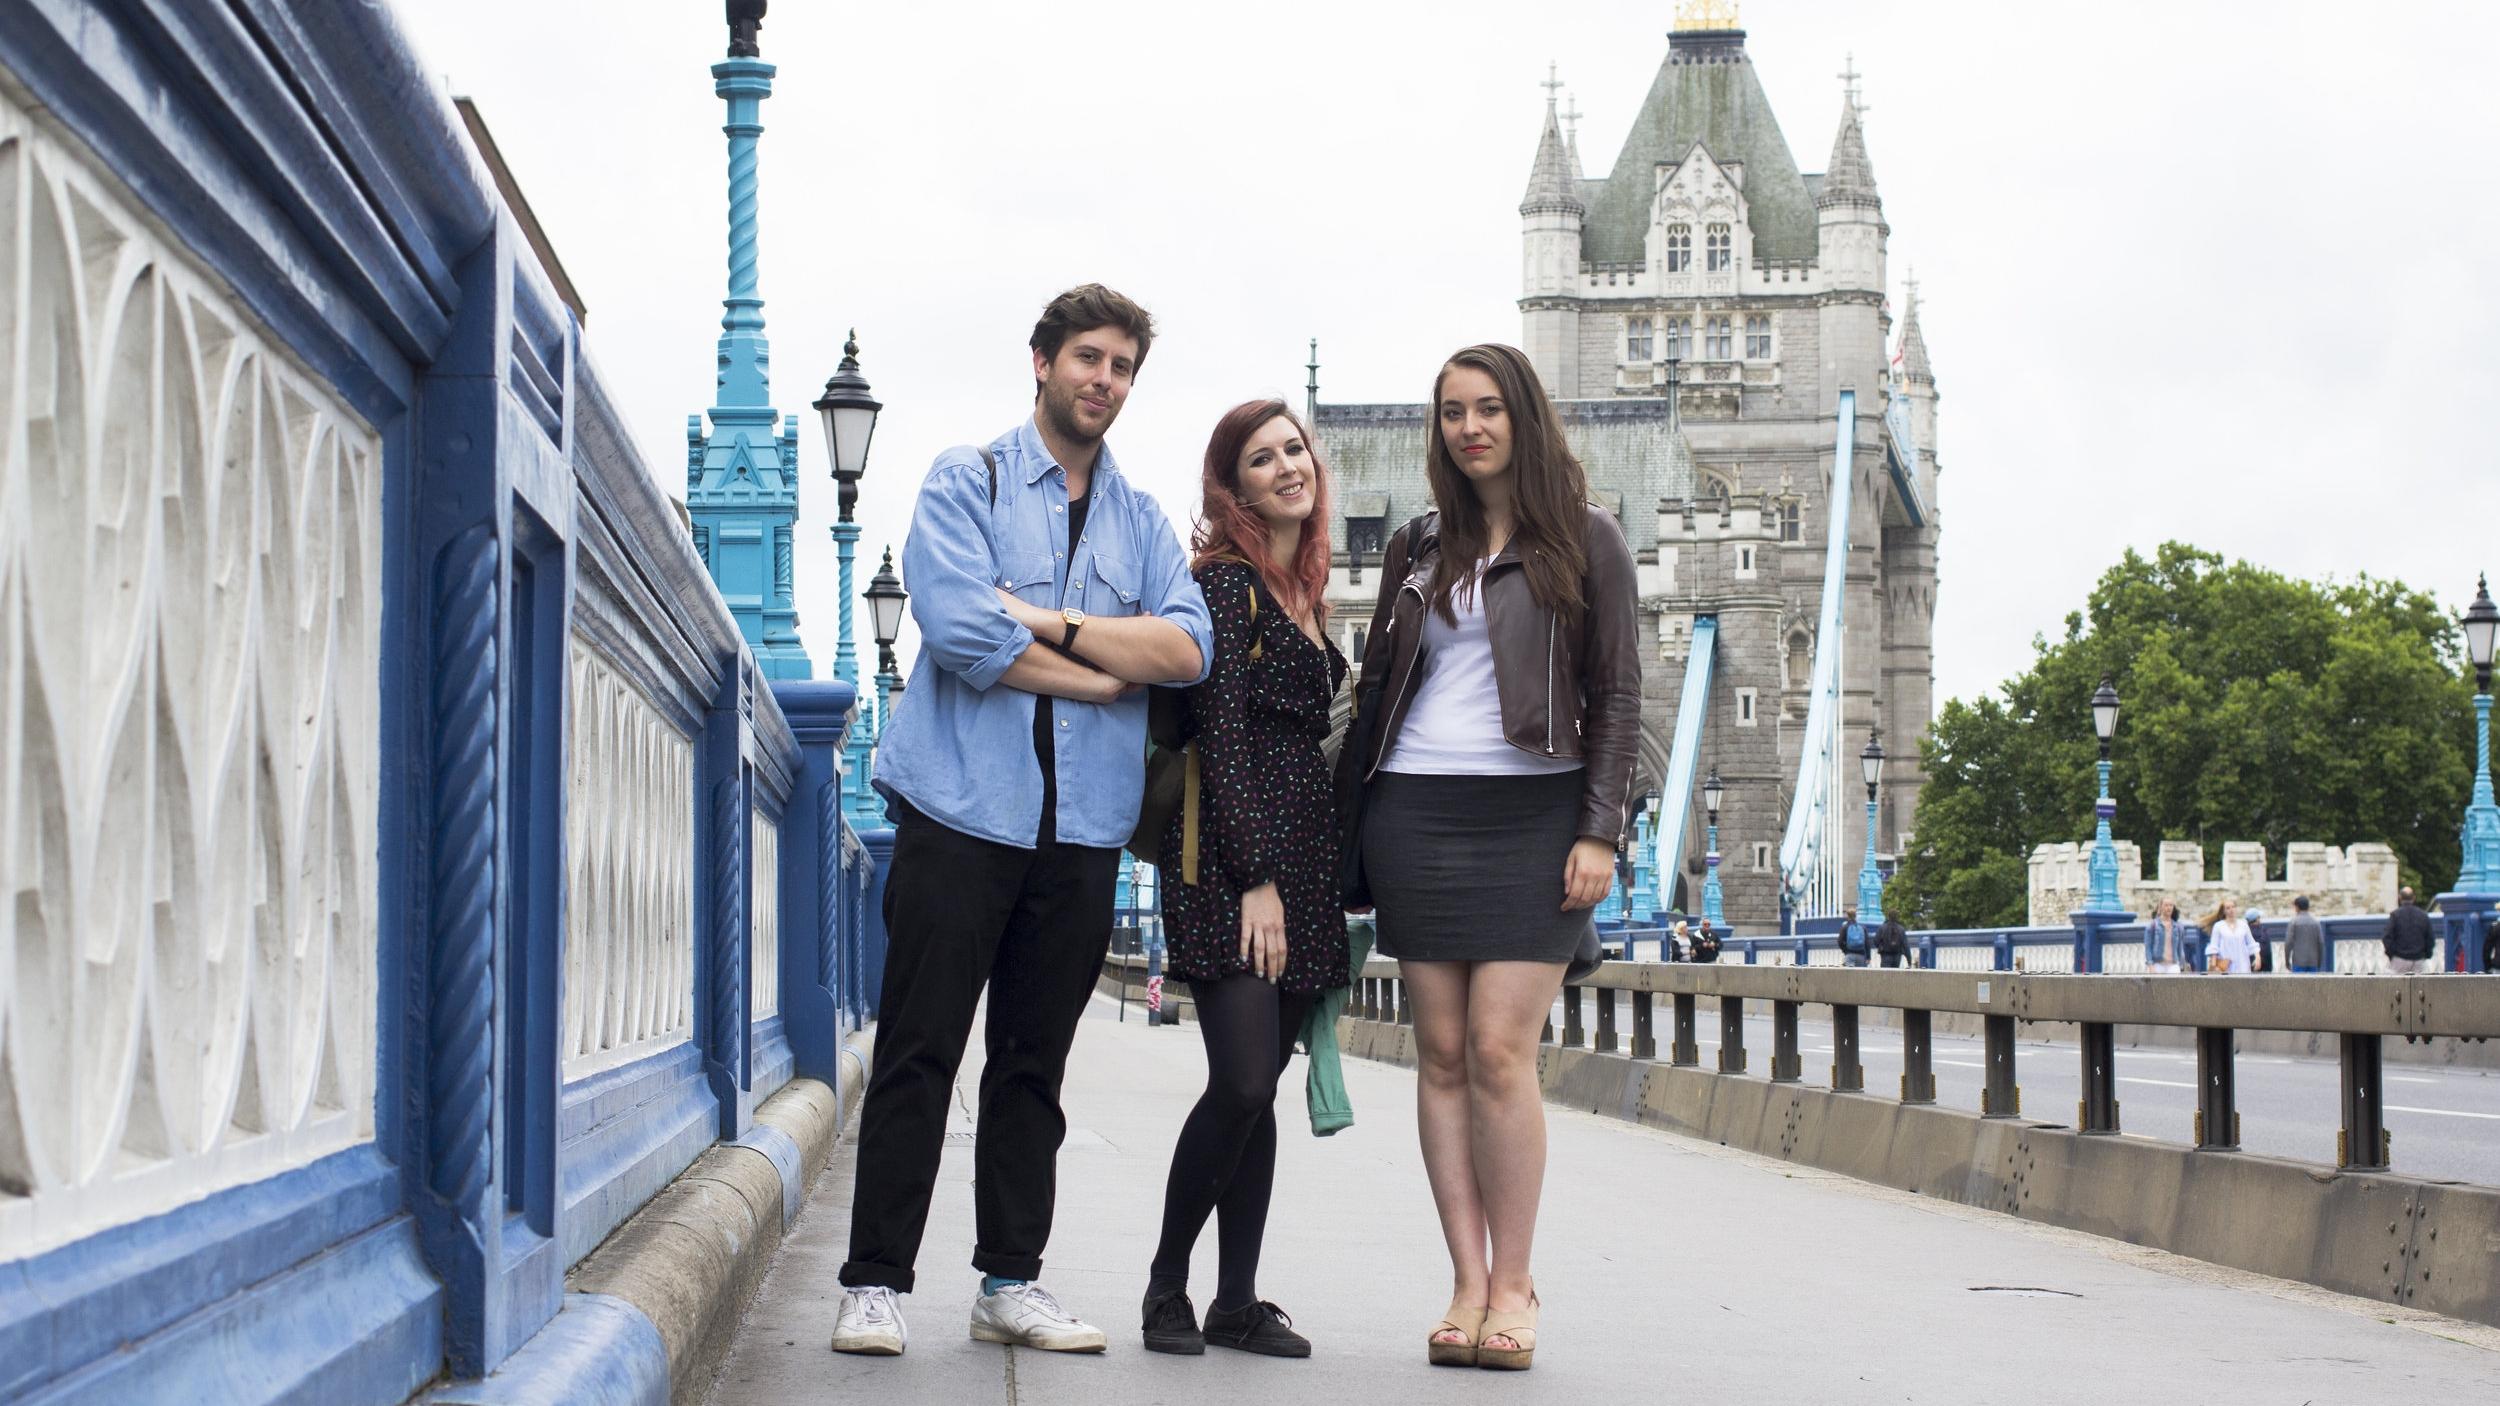 Huge School London students Luca, Carlota, and Agnieszka